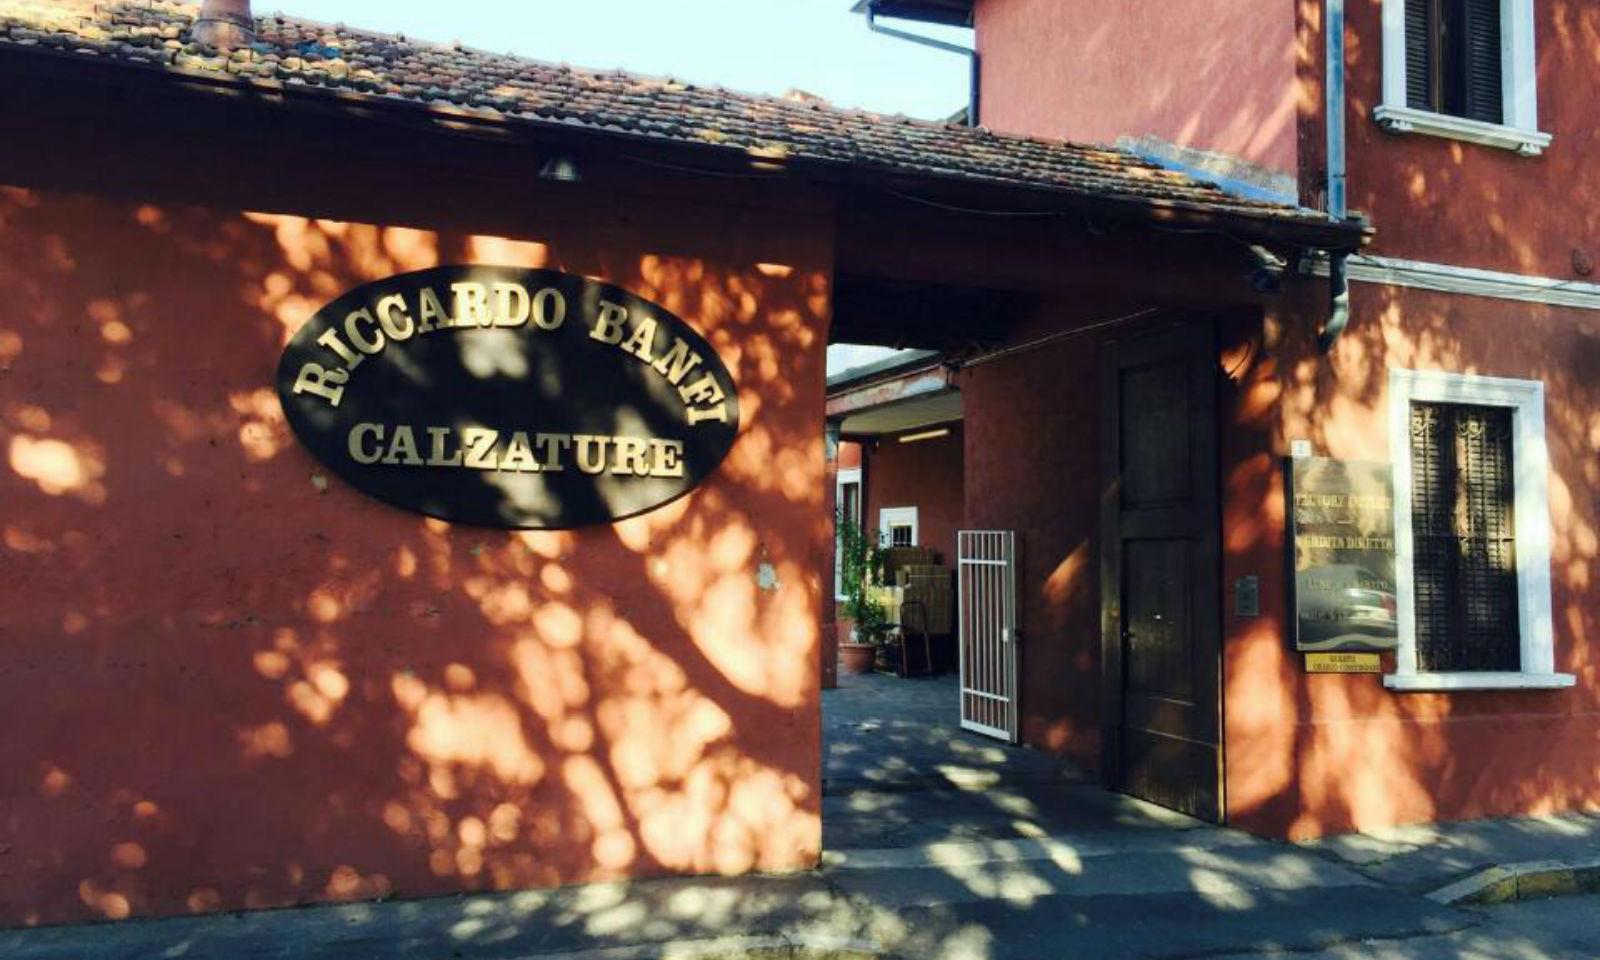 uk availability 75ddd 587b4 Riccardo Banfi Factory Outlet. Scarpe uomo scontate -Stile ...